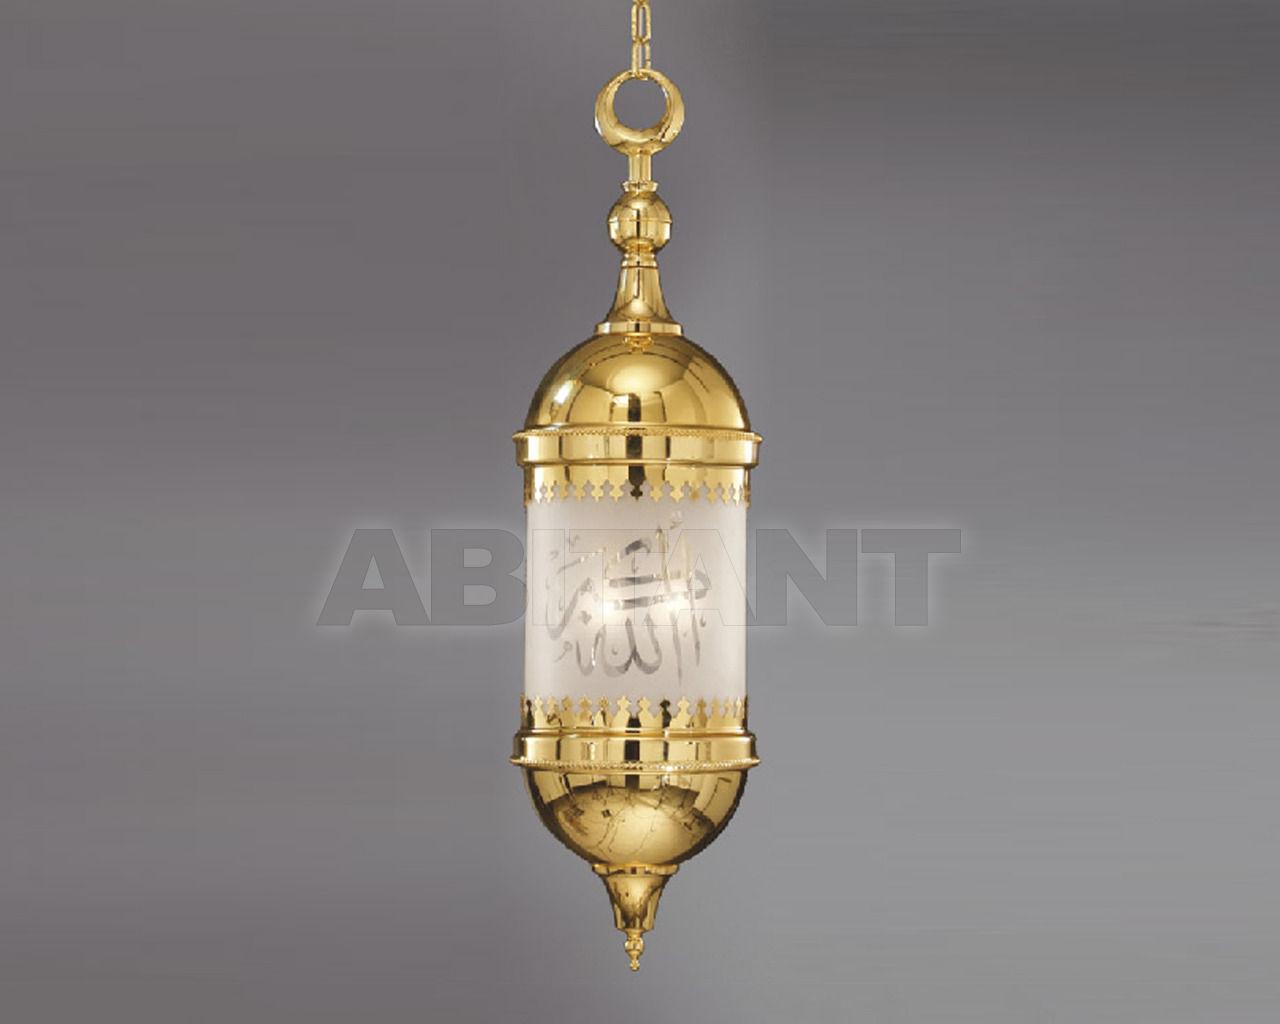 Купить Светильник Asfour Crystal Crystal 2013 LN S. ZEINAB 25*105 wihtout bulbs